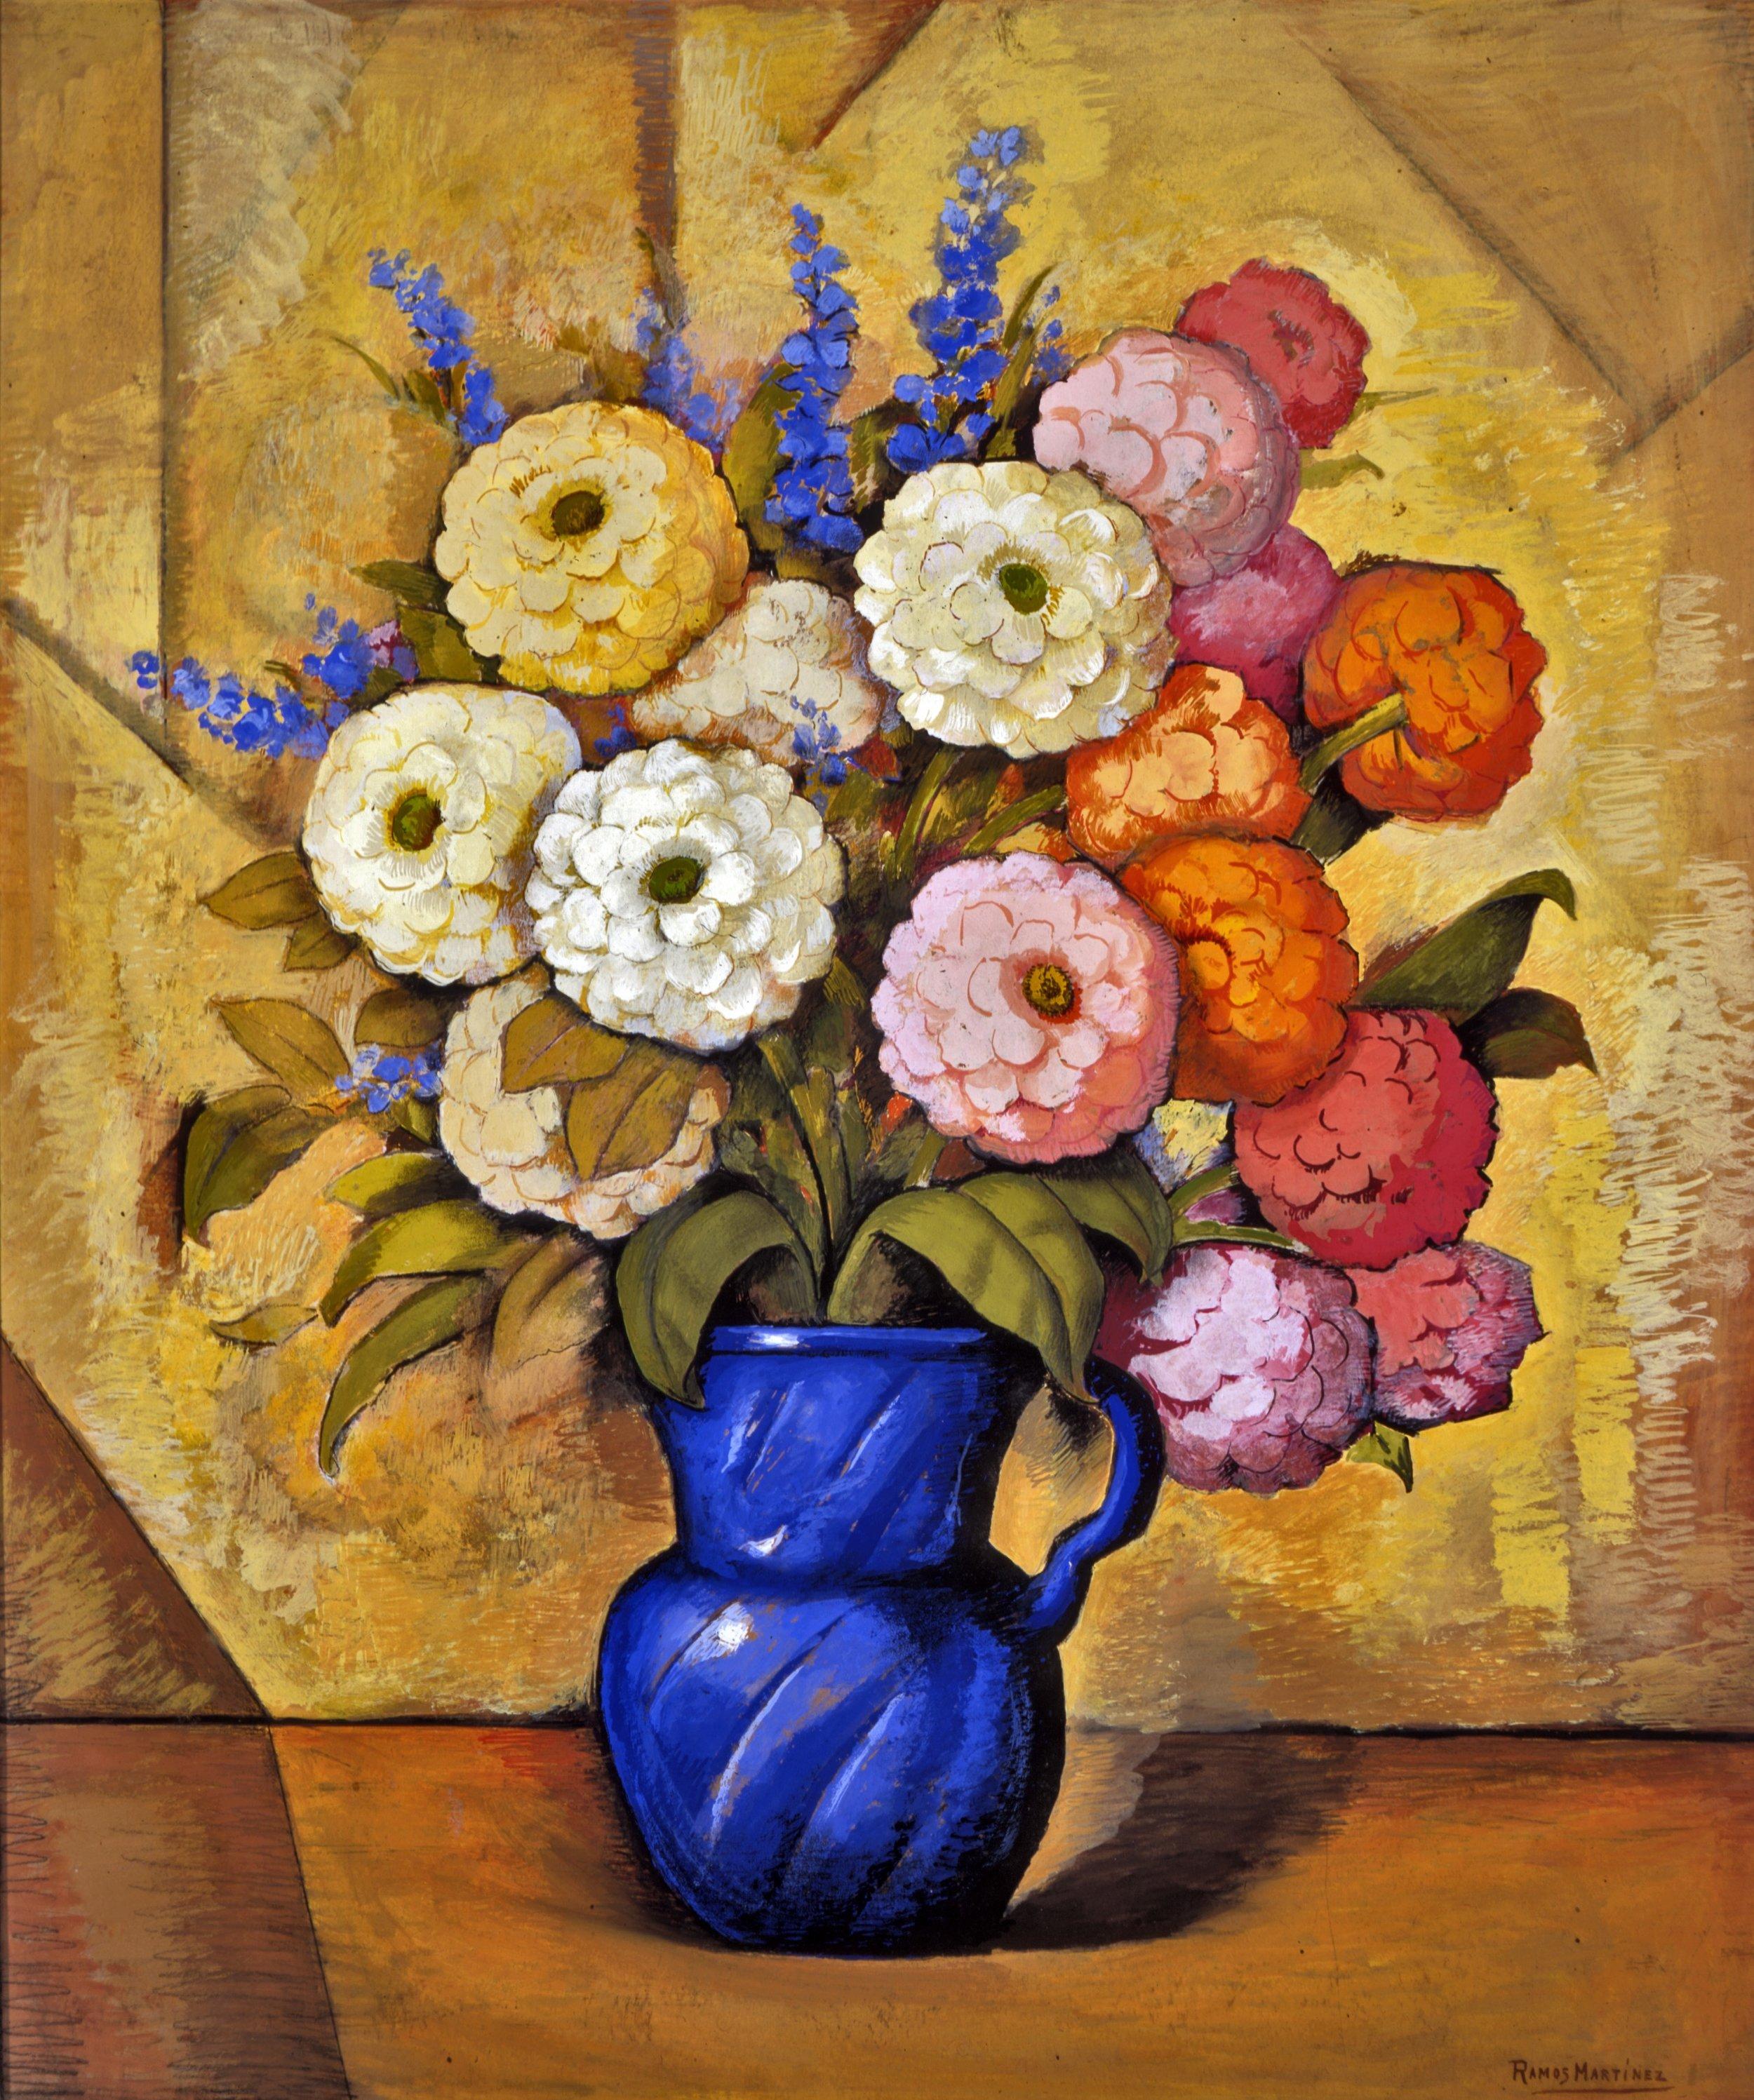 Jarrón Azul con Flores / Flowers in a Blue Vase  ca. 1934 tempera on paper / temple sobre papel 36 x 29.9 inches; 91.4 x 75.9 centímetros Private collection